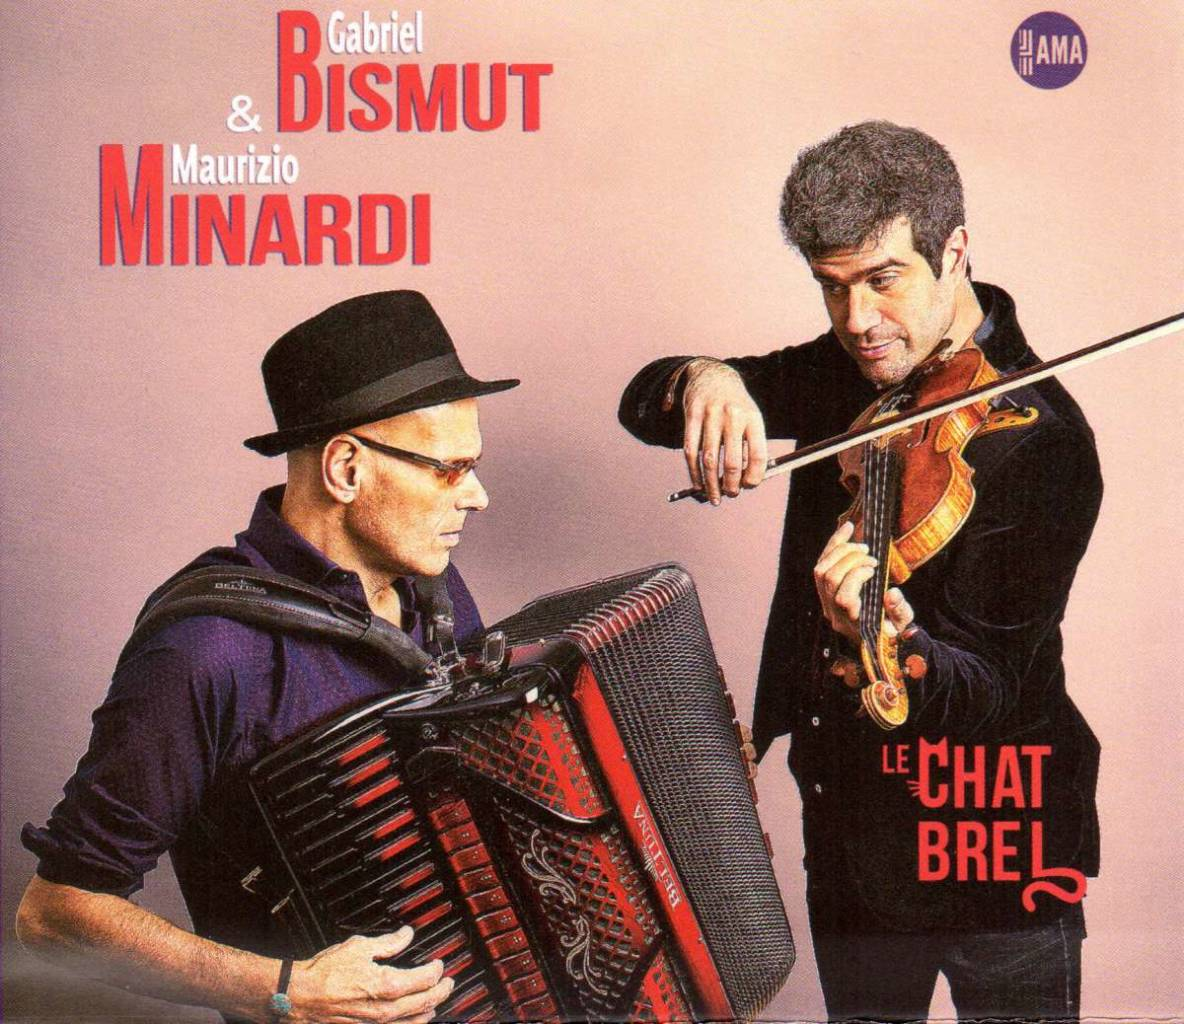 Maurizio Minardi and Gabriel Bismut Album cover - Le Chat Brel